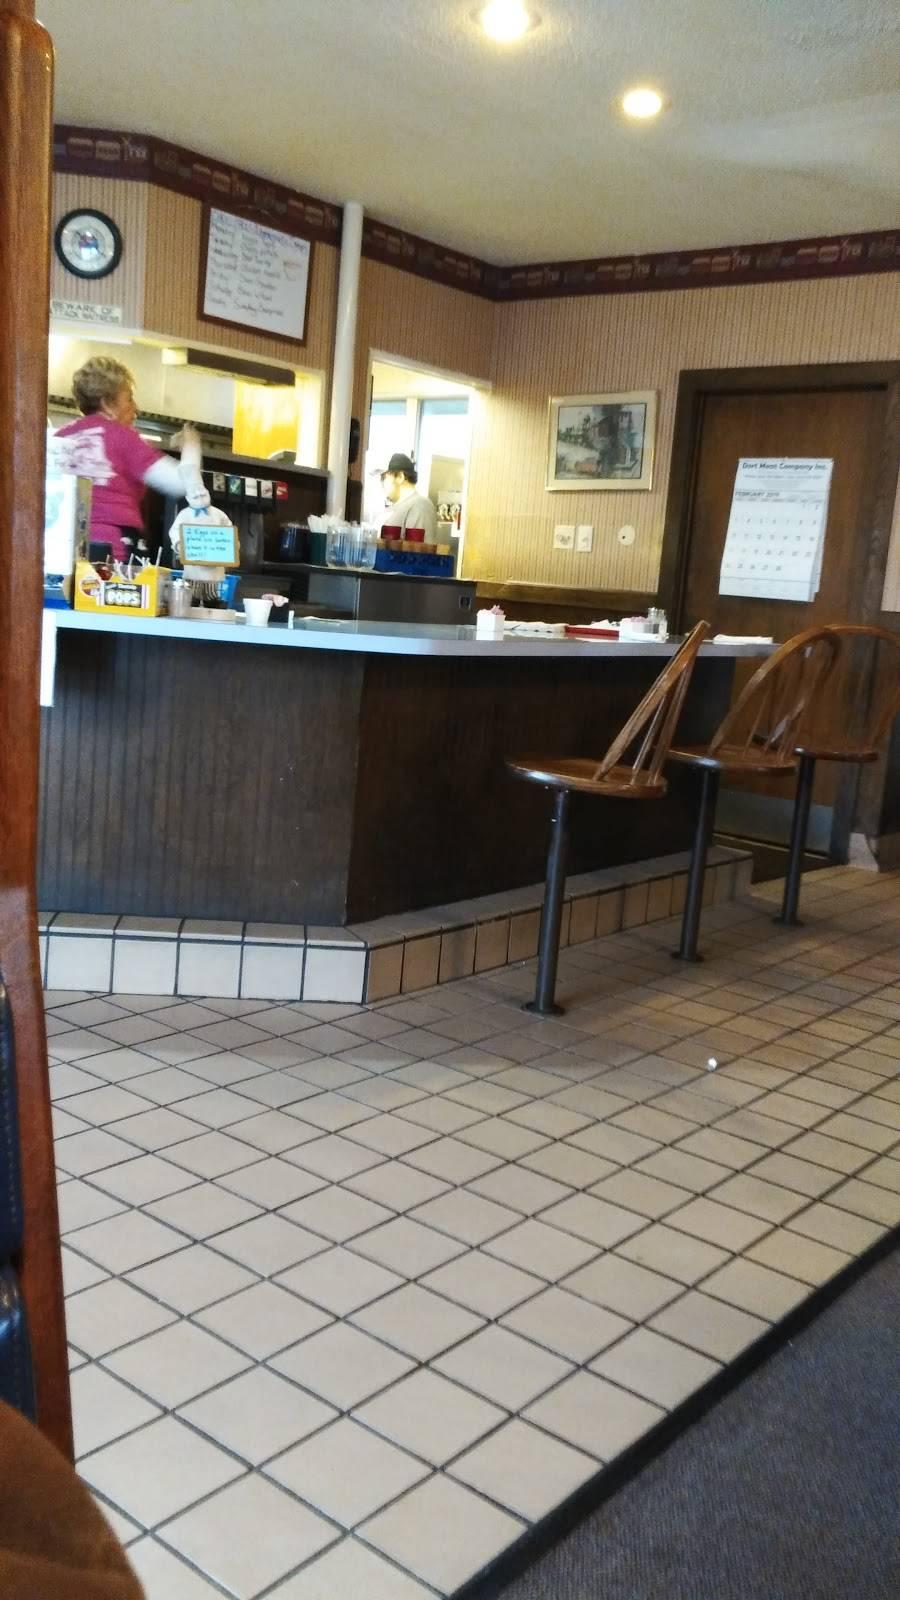 Choo Choos | restaurant | 424 Emily St, Flushing, MI 48433, USA | 8106595103 OR +1 810-659-5103